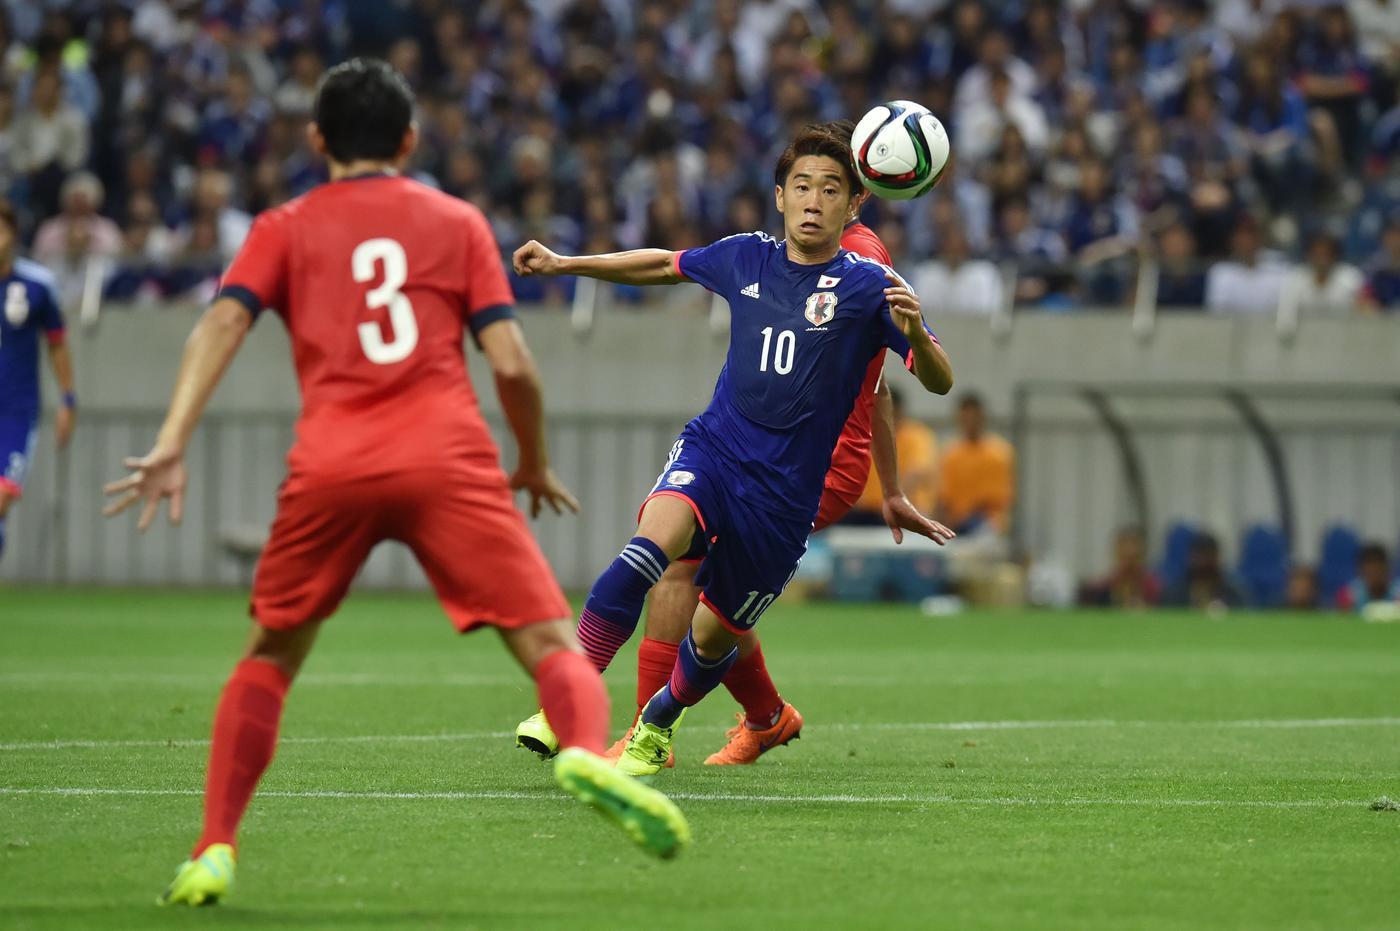 Manchester United misfit Shinji Kagawa scores beautiful 25-yard goal for Japan